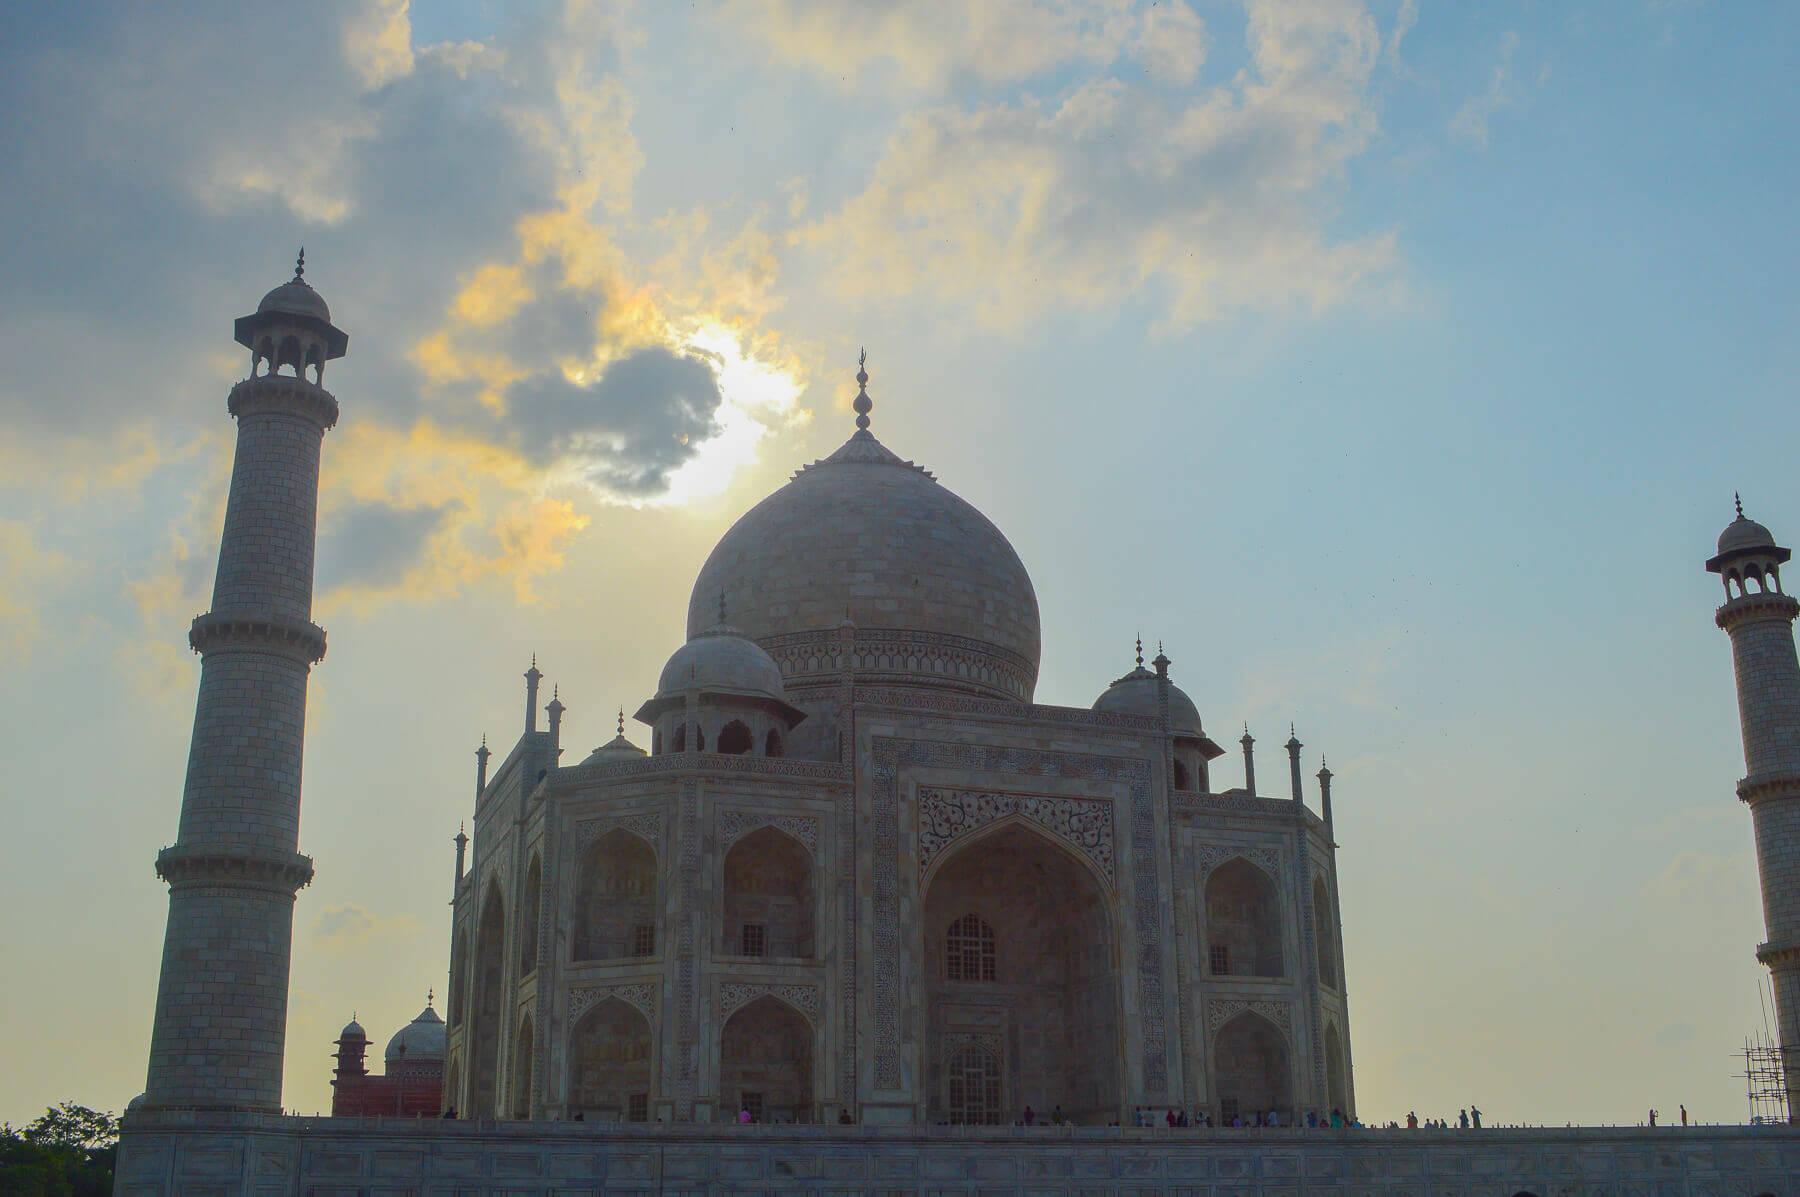 Sunset behind the Taj Mahal